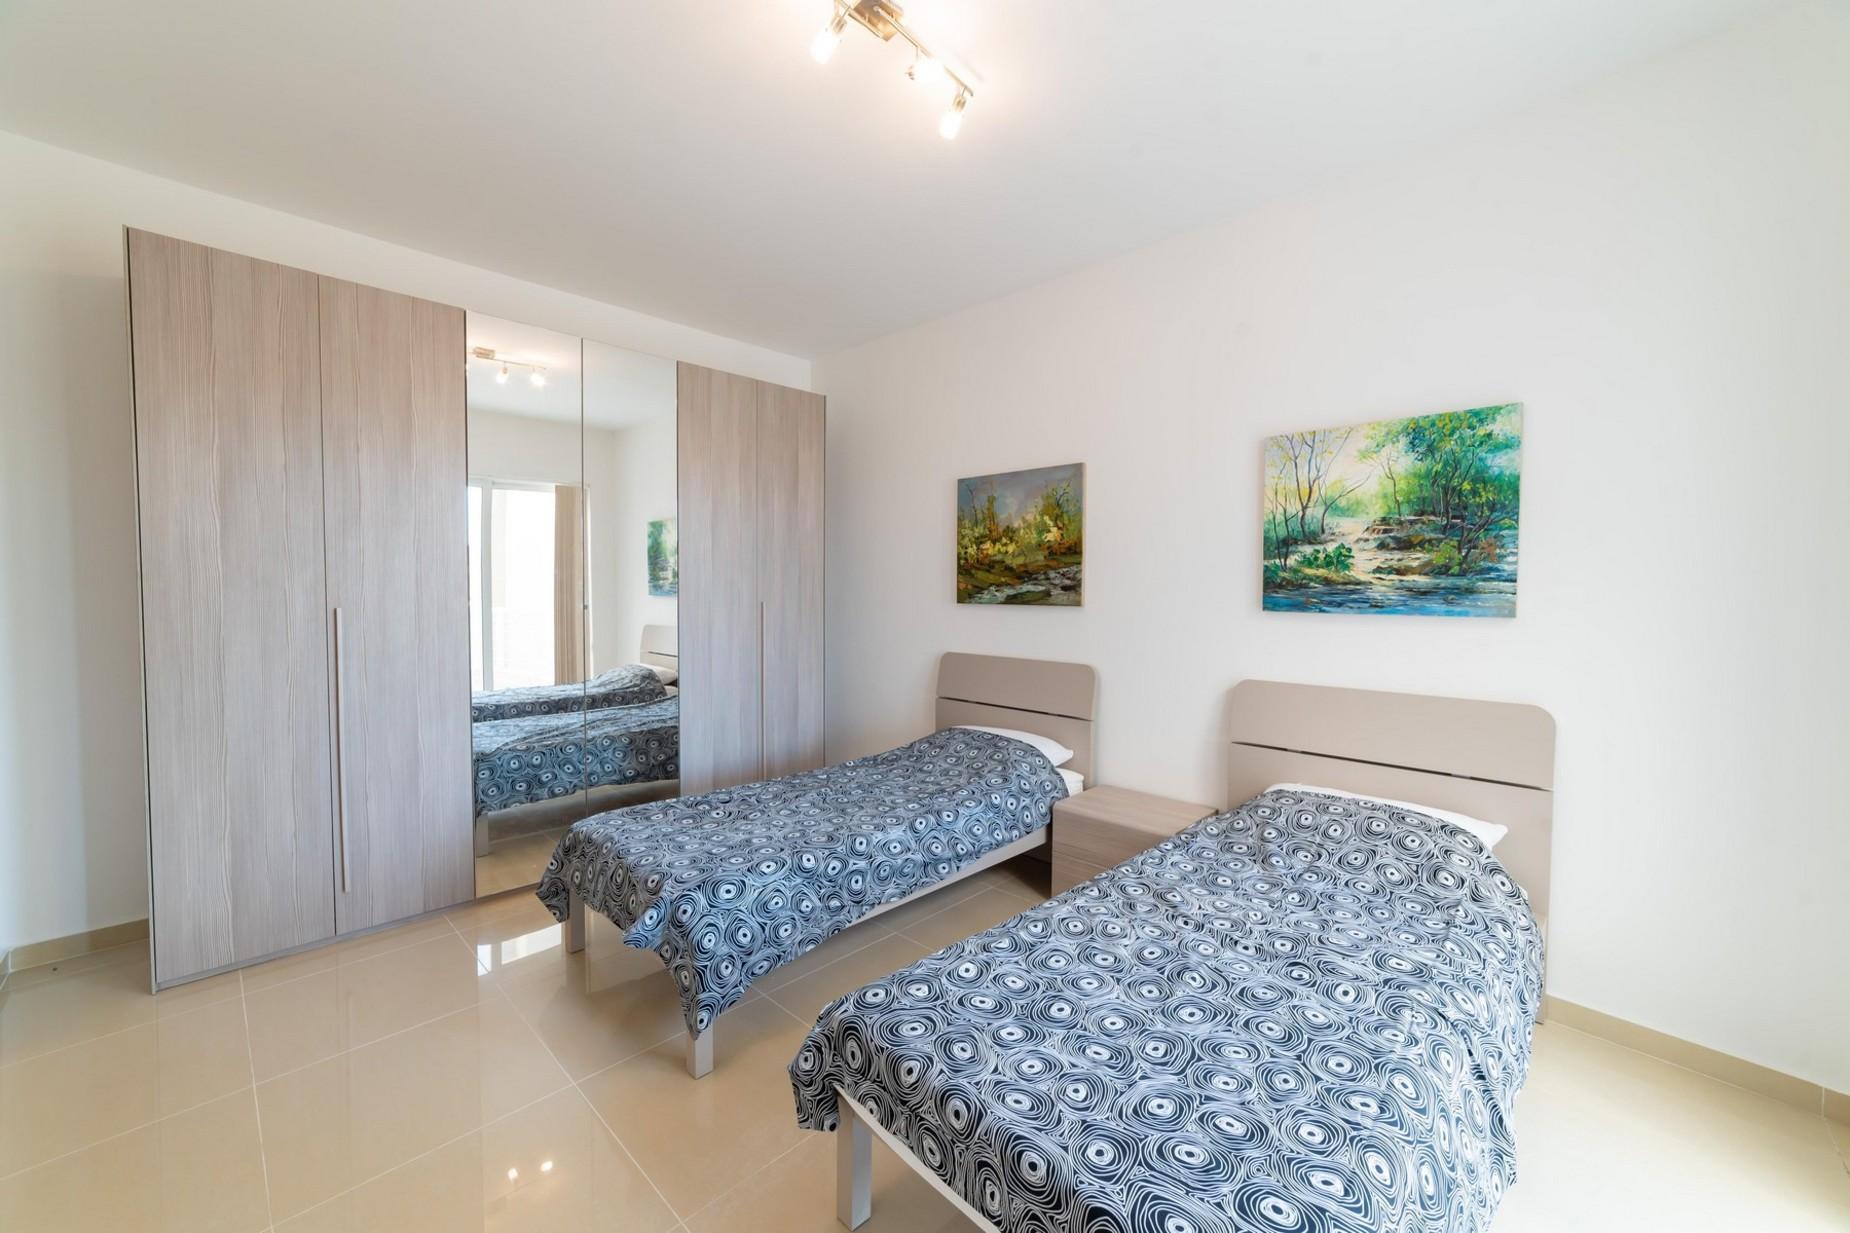 3 bed Apartment For Rent in Balzan, Balzan - thumb 11